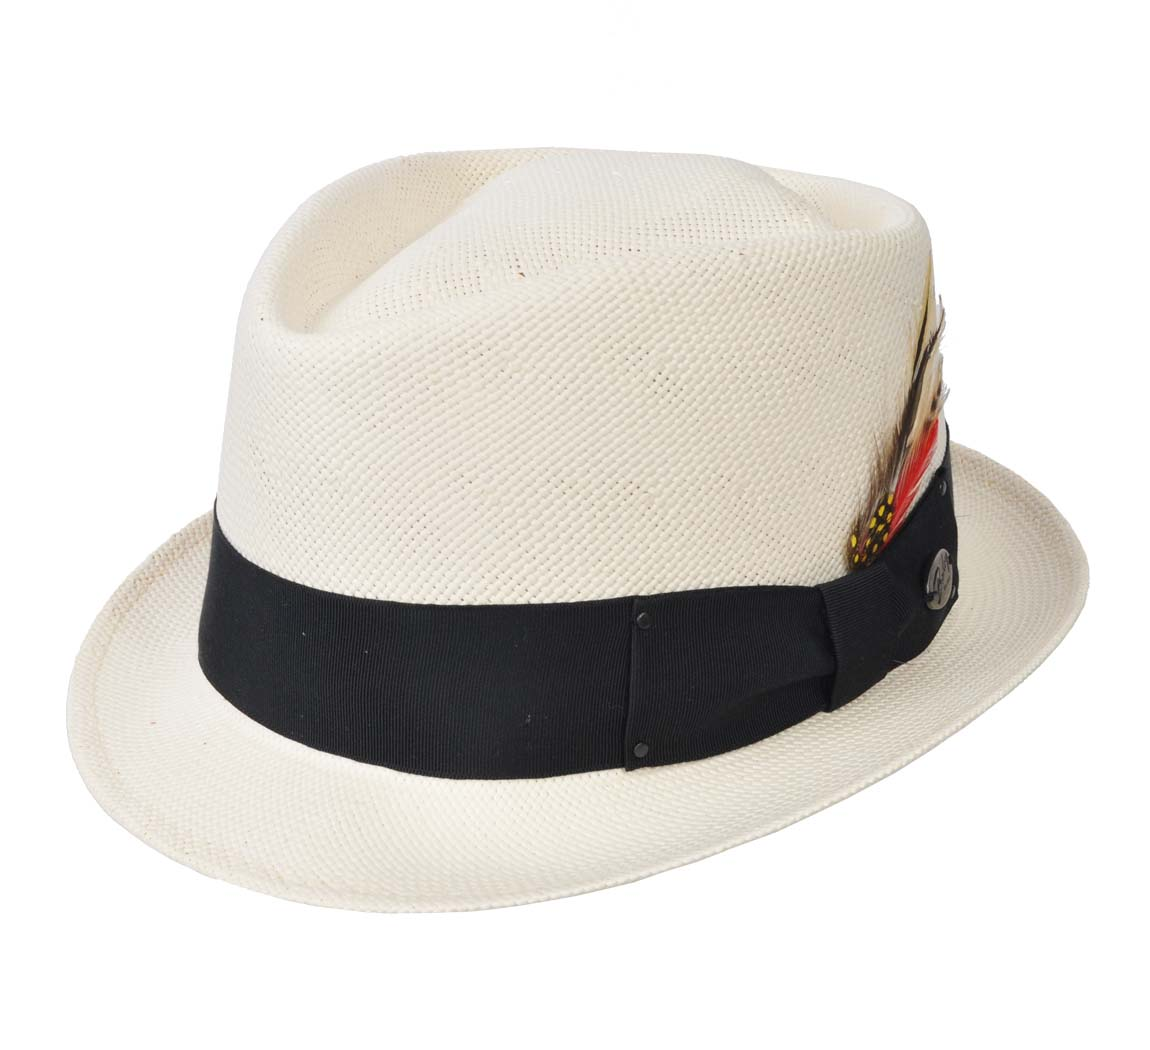 chapeau femme crosby chapeau. Black Bedroom Furniture Sets. Home Design Ideas